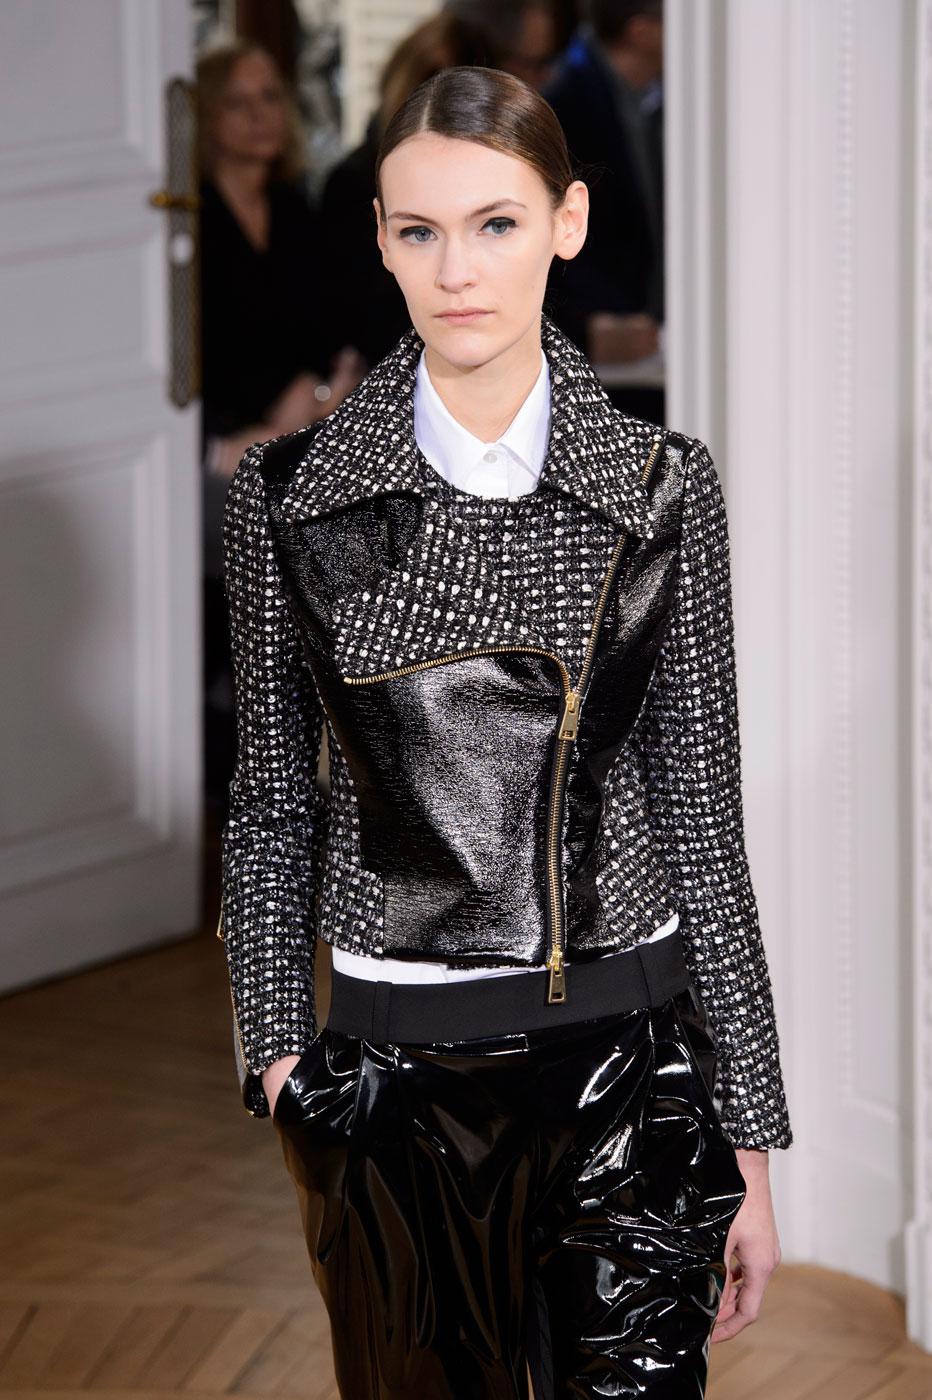 Bouchra-Jarrar-fashion-runway-show-haute-couture-paris-spring-summer-2015-the-impression-02